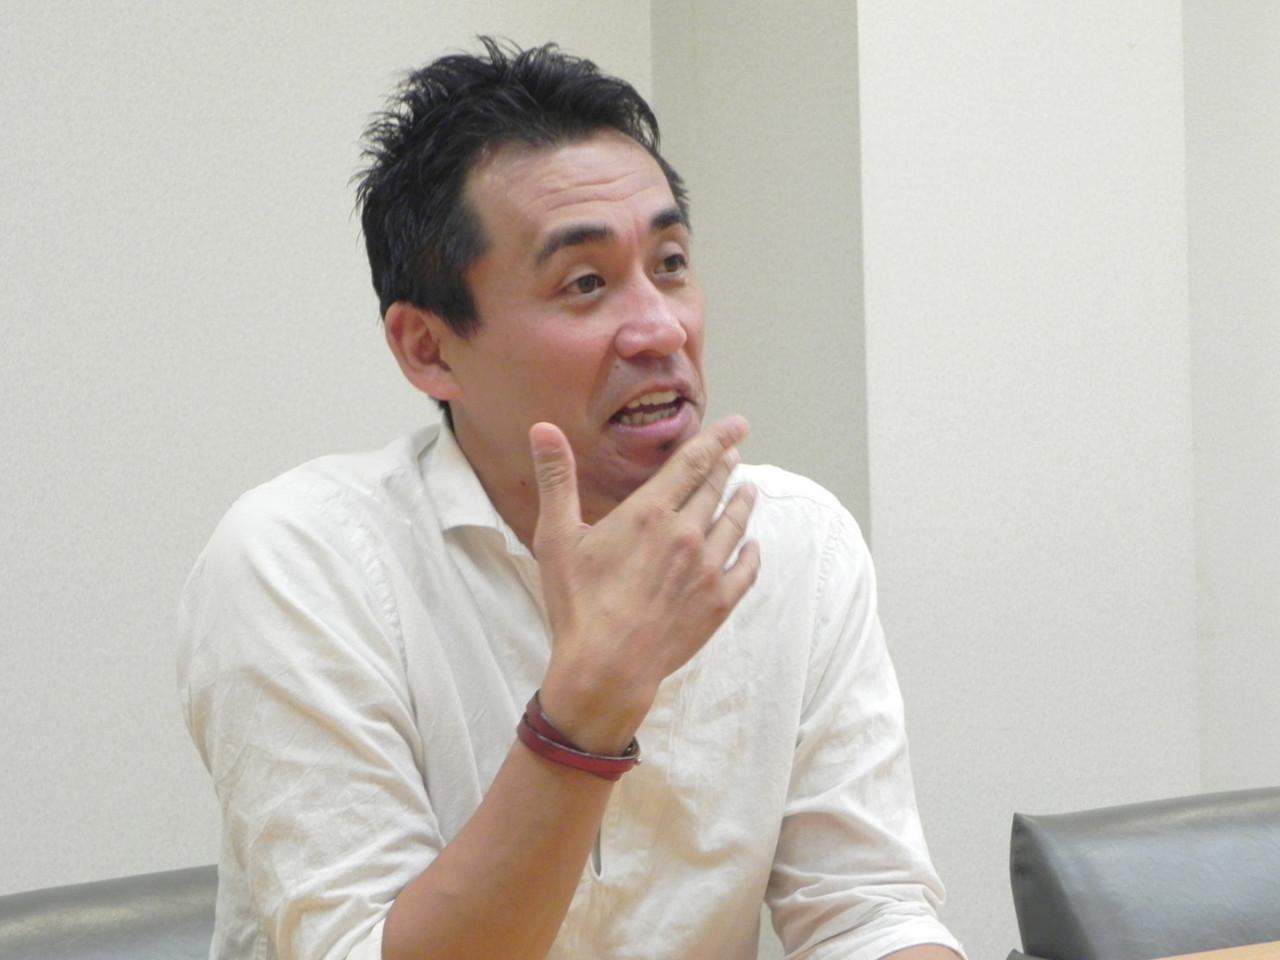 http://news.yoshimoto.co.jp/photos/uncategorized/2014/10/17/dscn8088.jpg